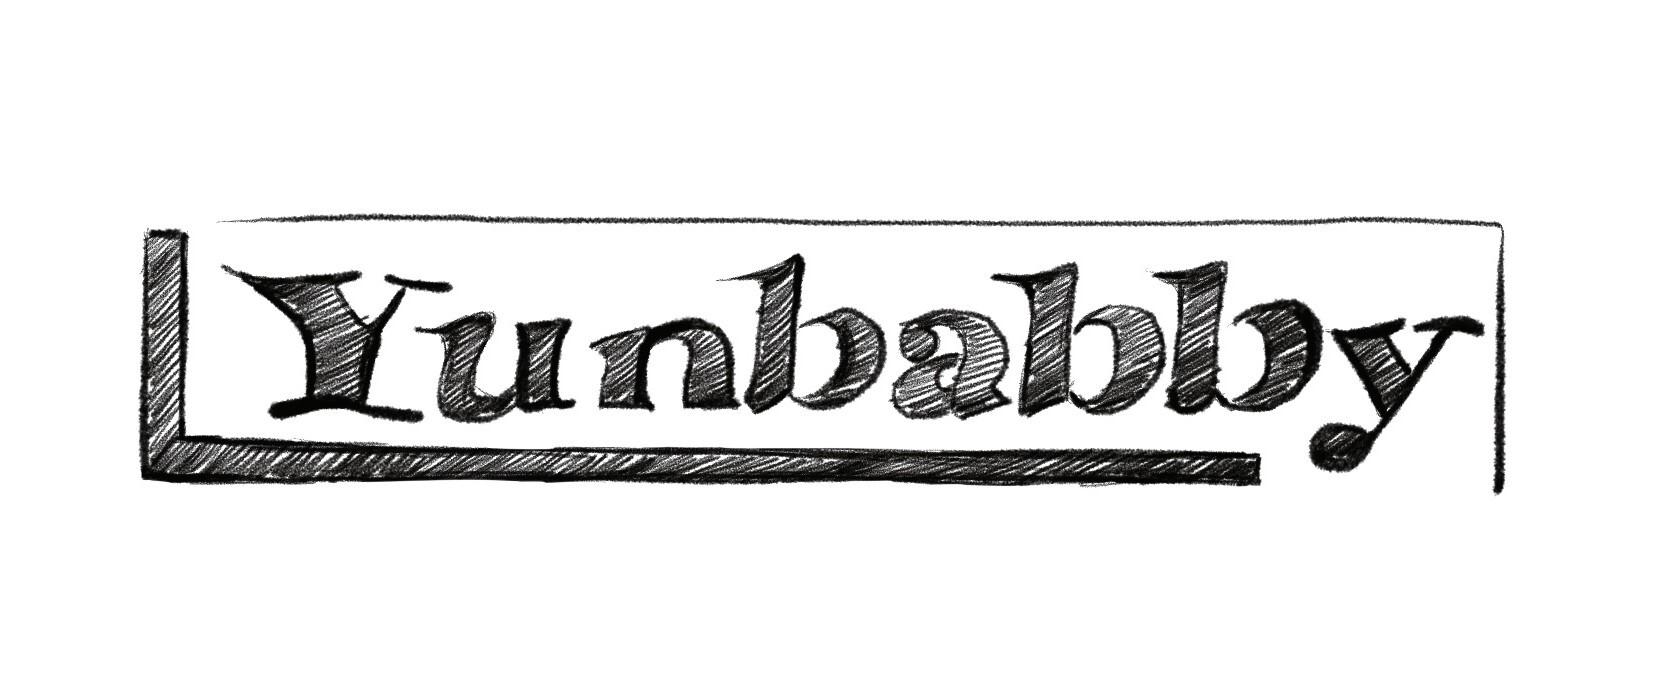 YUNBABBY